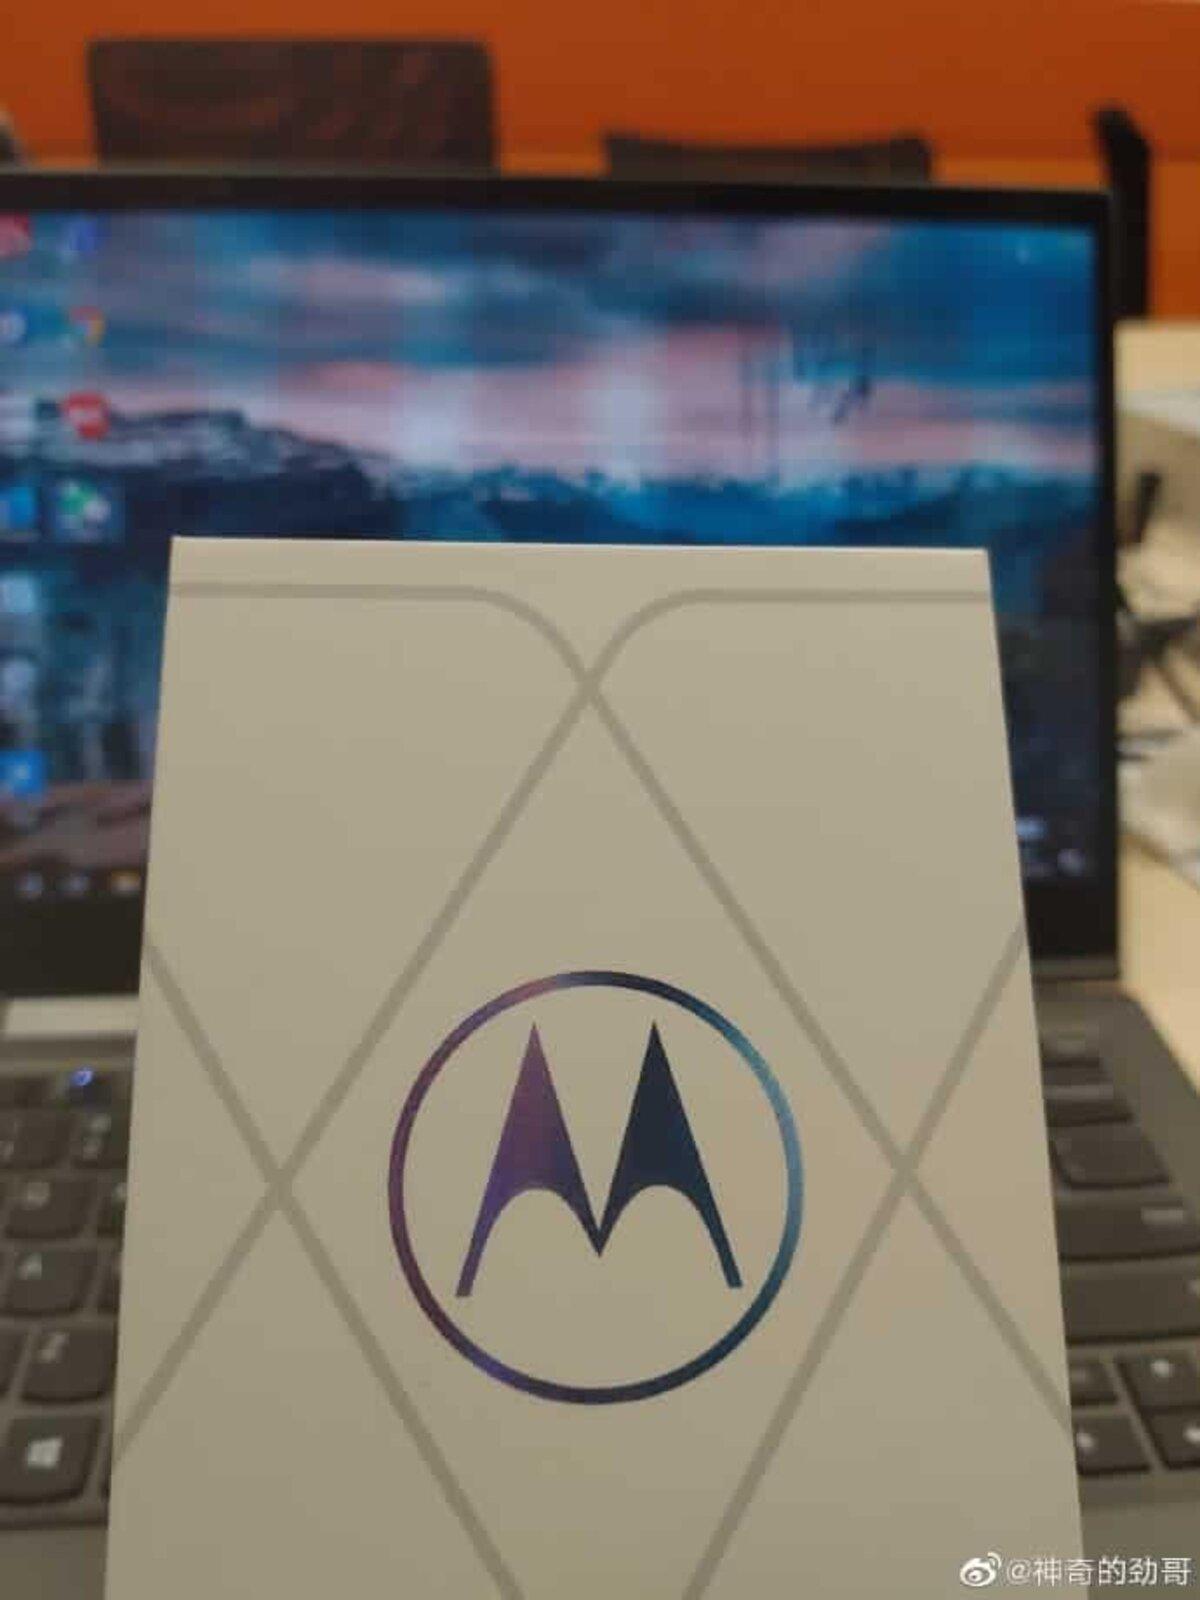 Mobile Motorola avec Snapdragon 888.